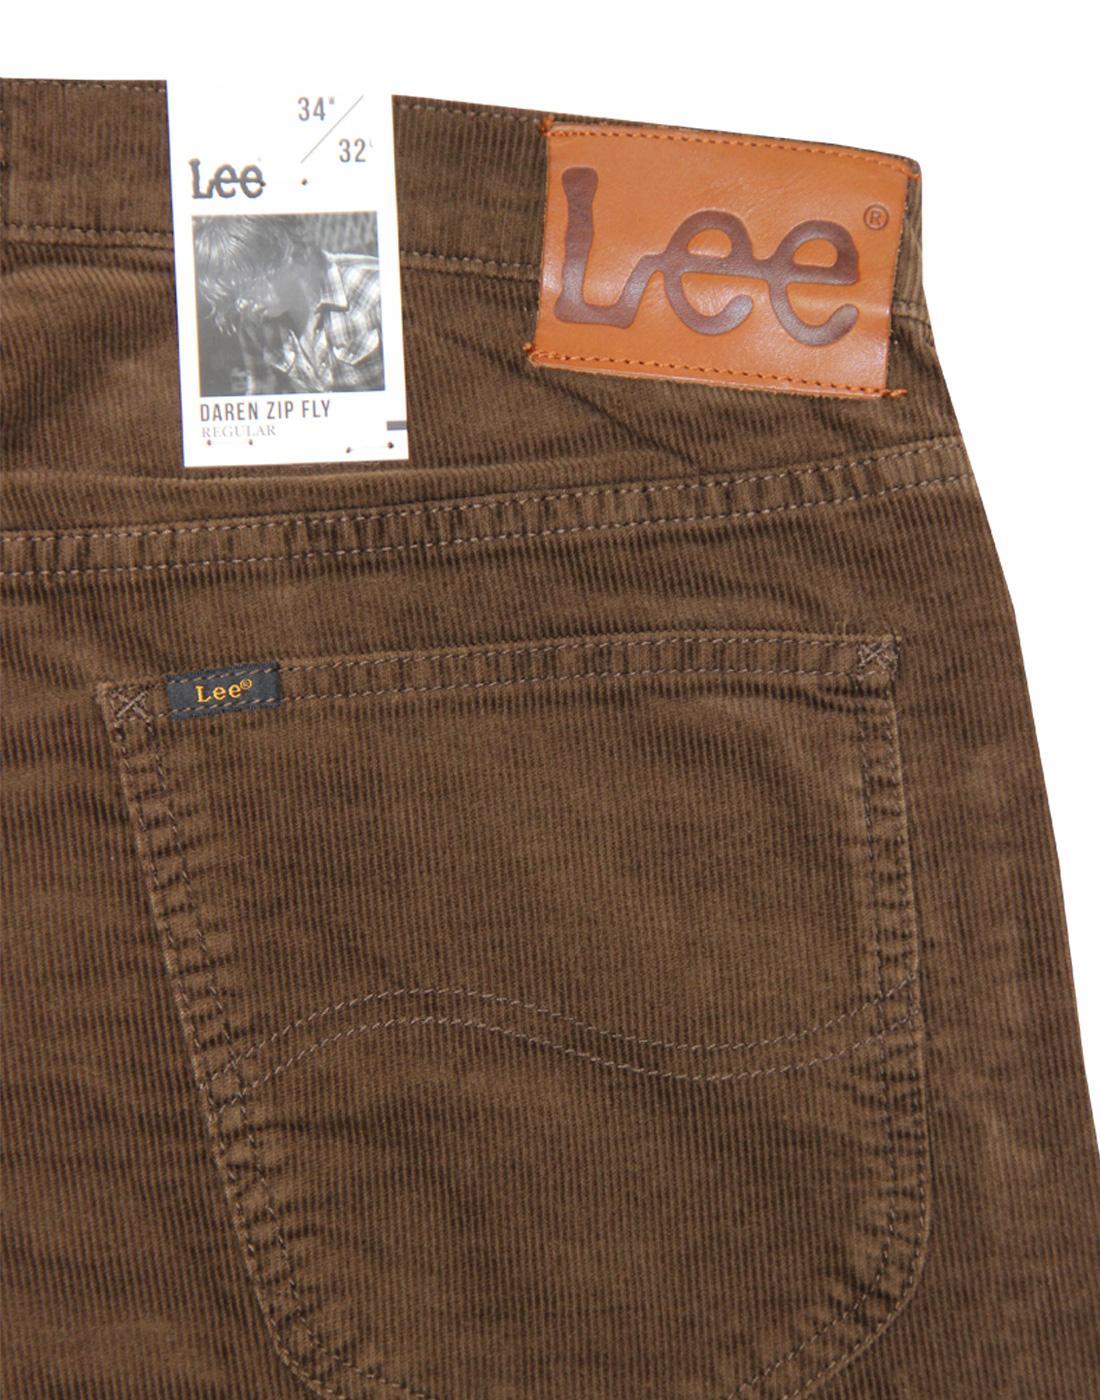 883b1e75 LEE Daren Men's Retro 1960s Mod Slim Cord Trousers in Dark Brown